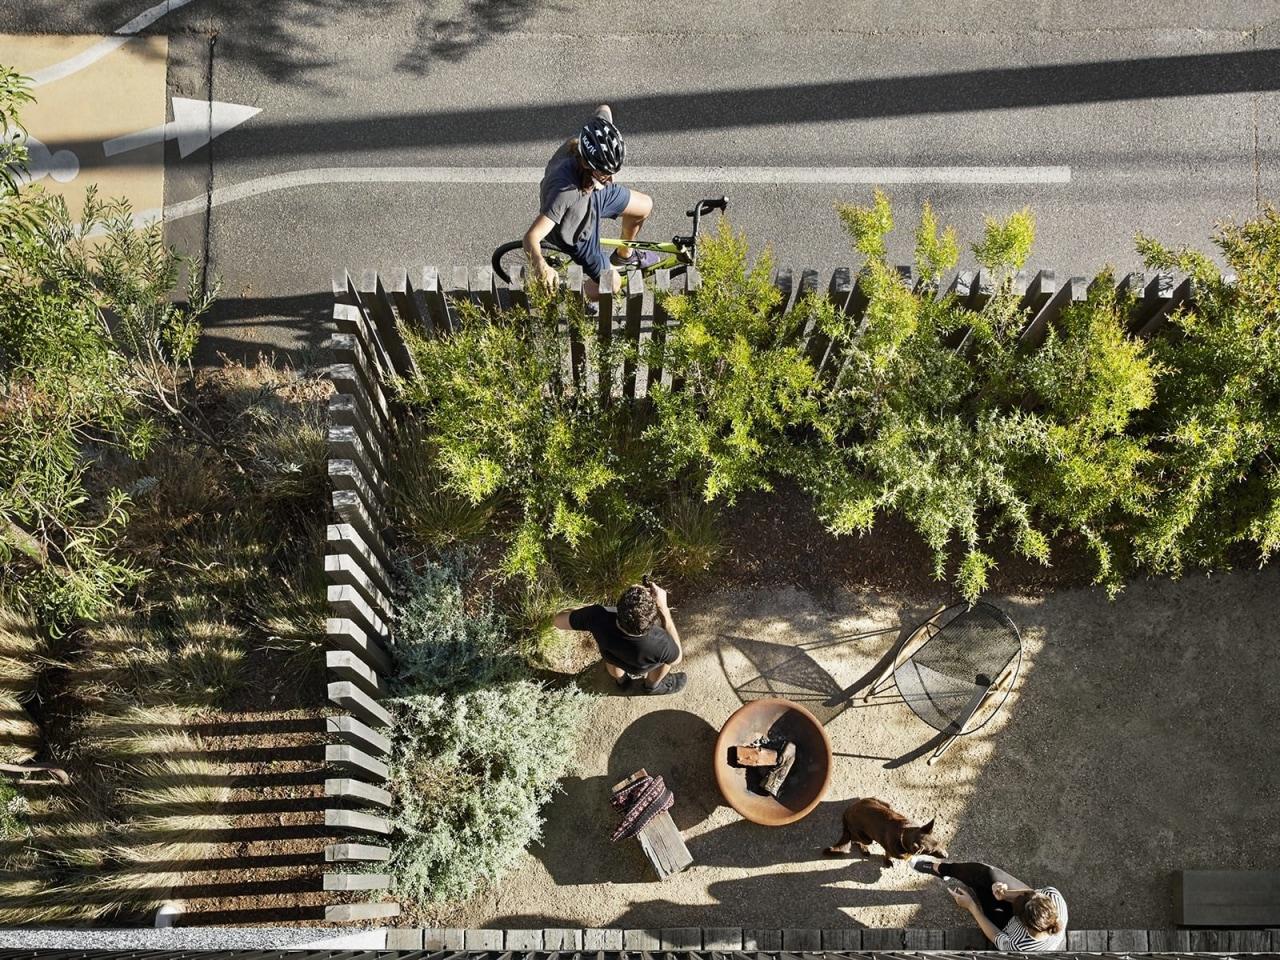 Architect: Liam WallisPhotography by Tess Kelly plant, tree, vehicle, black, gray